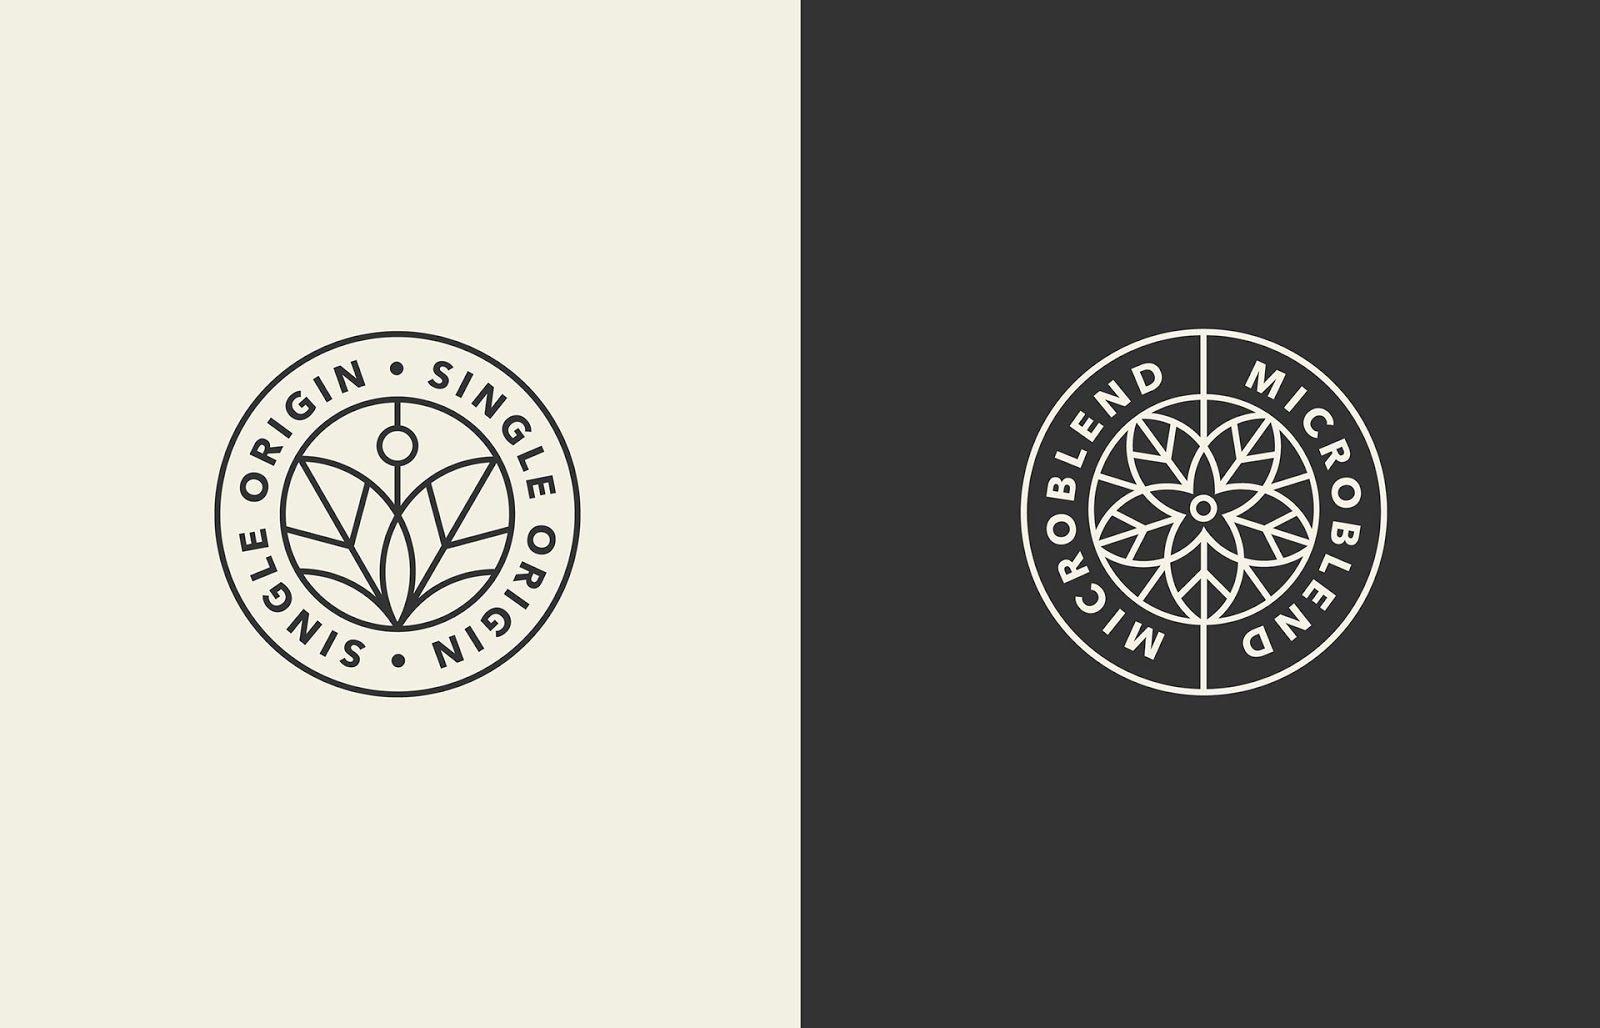 Starbucks Reserve Roastery Tasting Room Logos